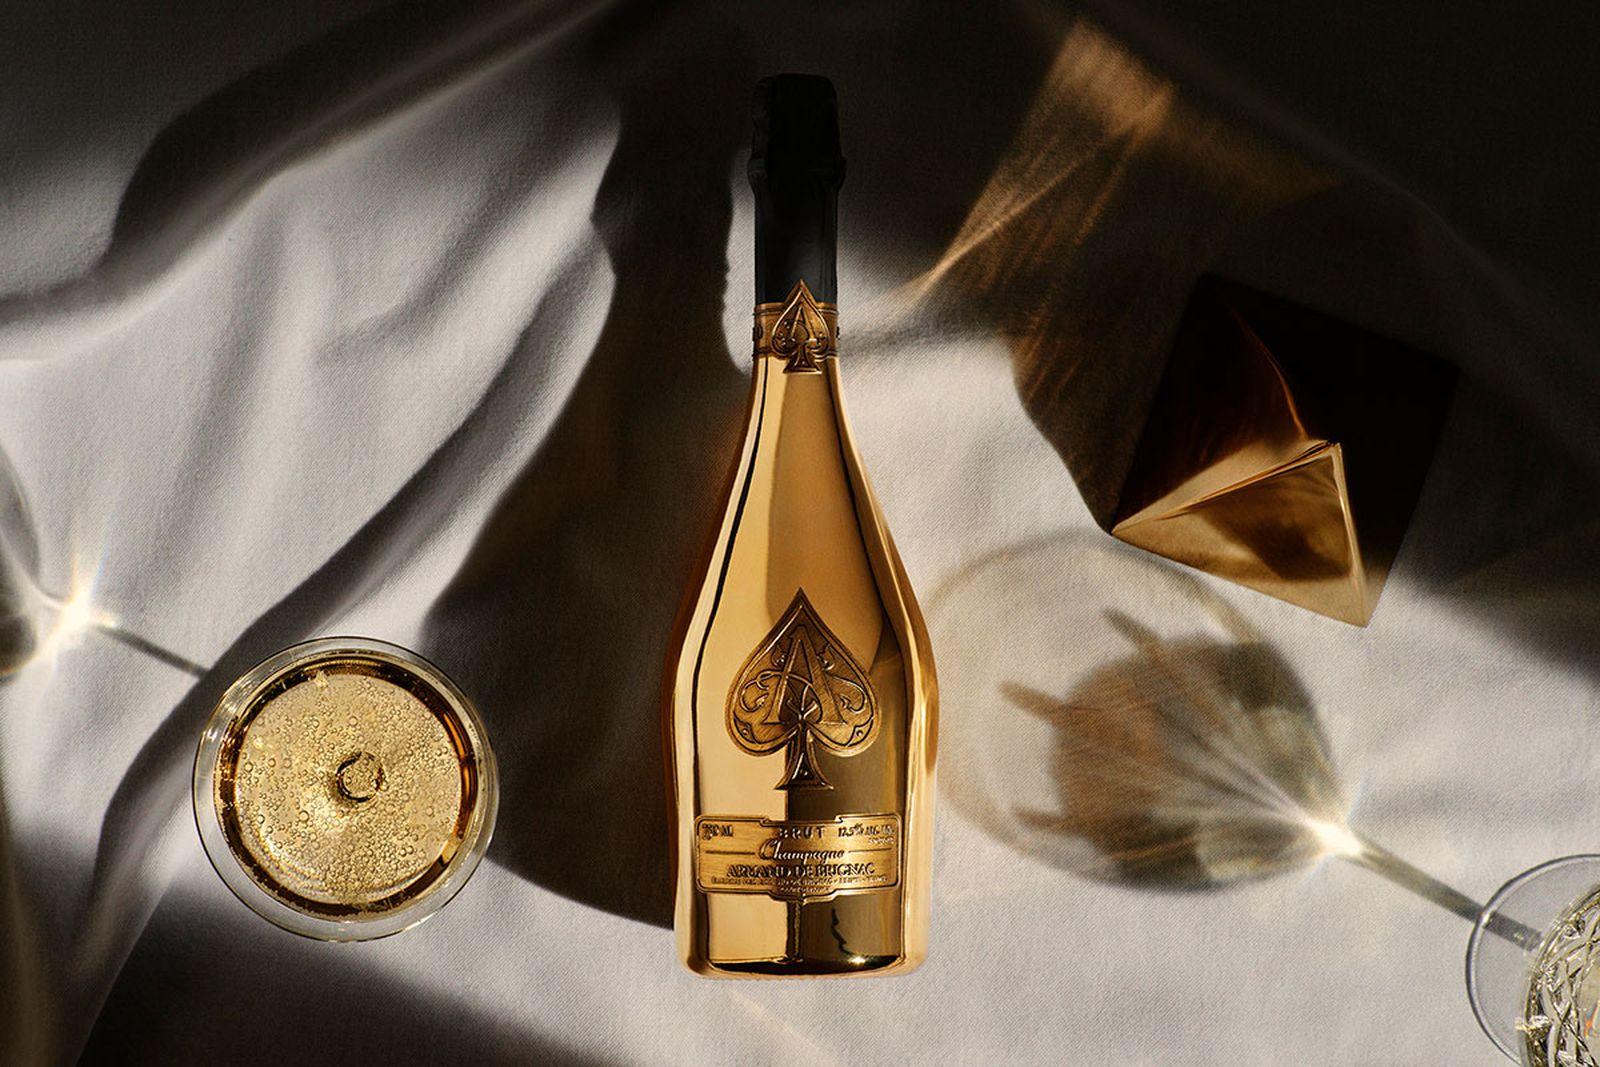 lvmh-jay-z-armand-de-brignac-champagne-01